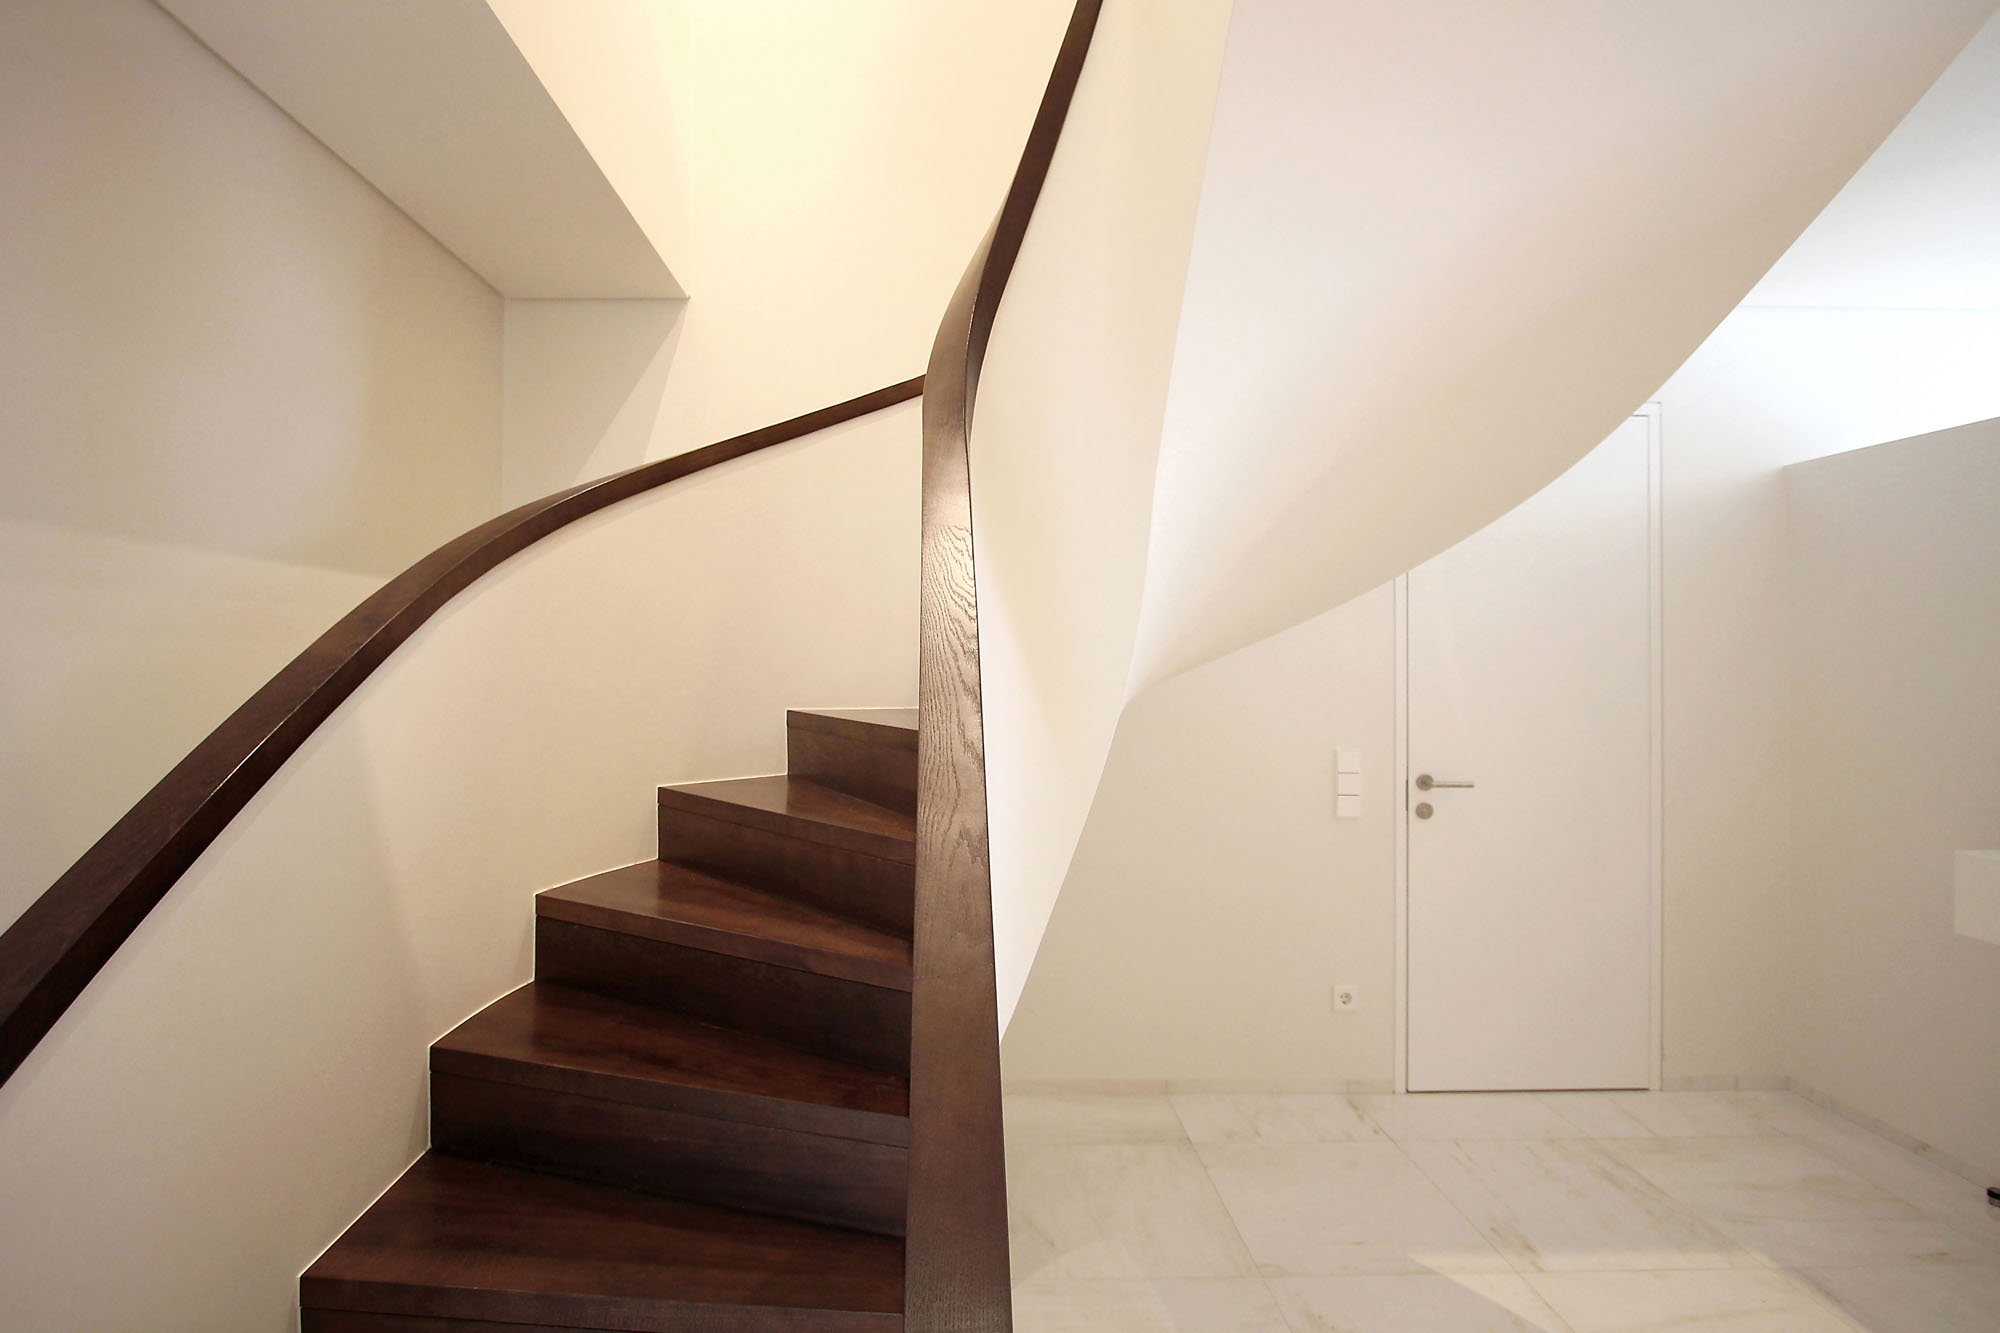 Minimal Style and White Colour Theme of House 02 by Ramunas Manikas-12